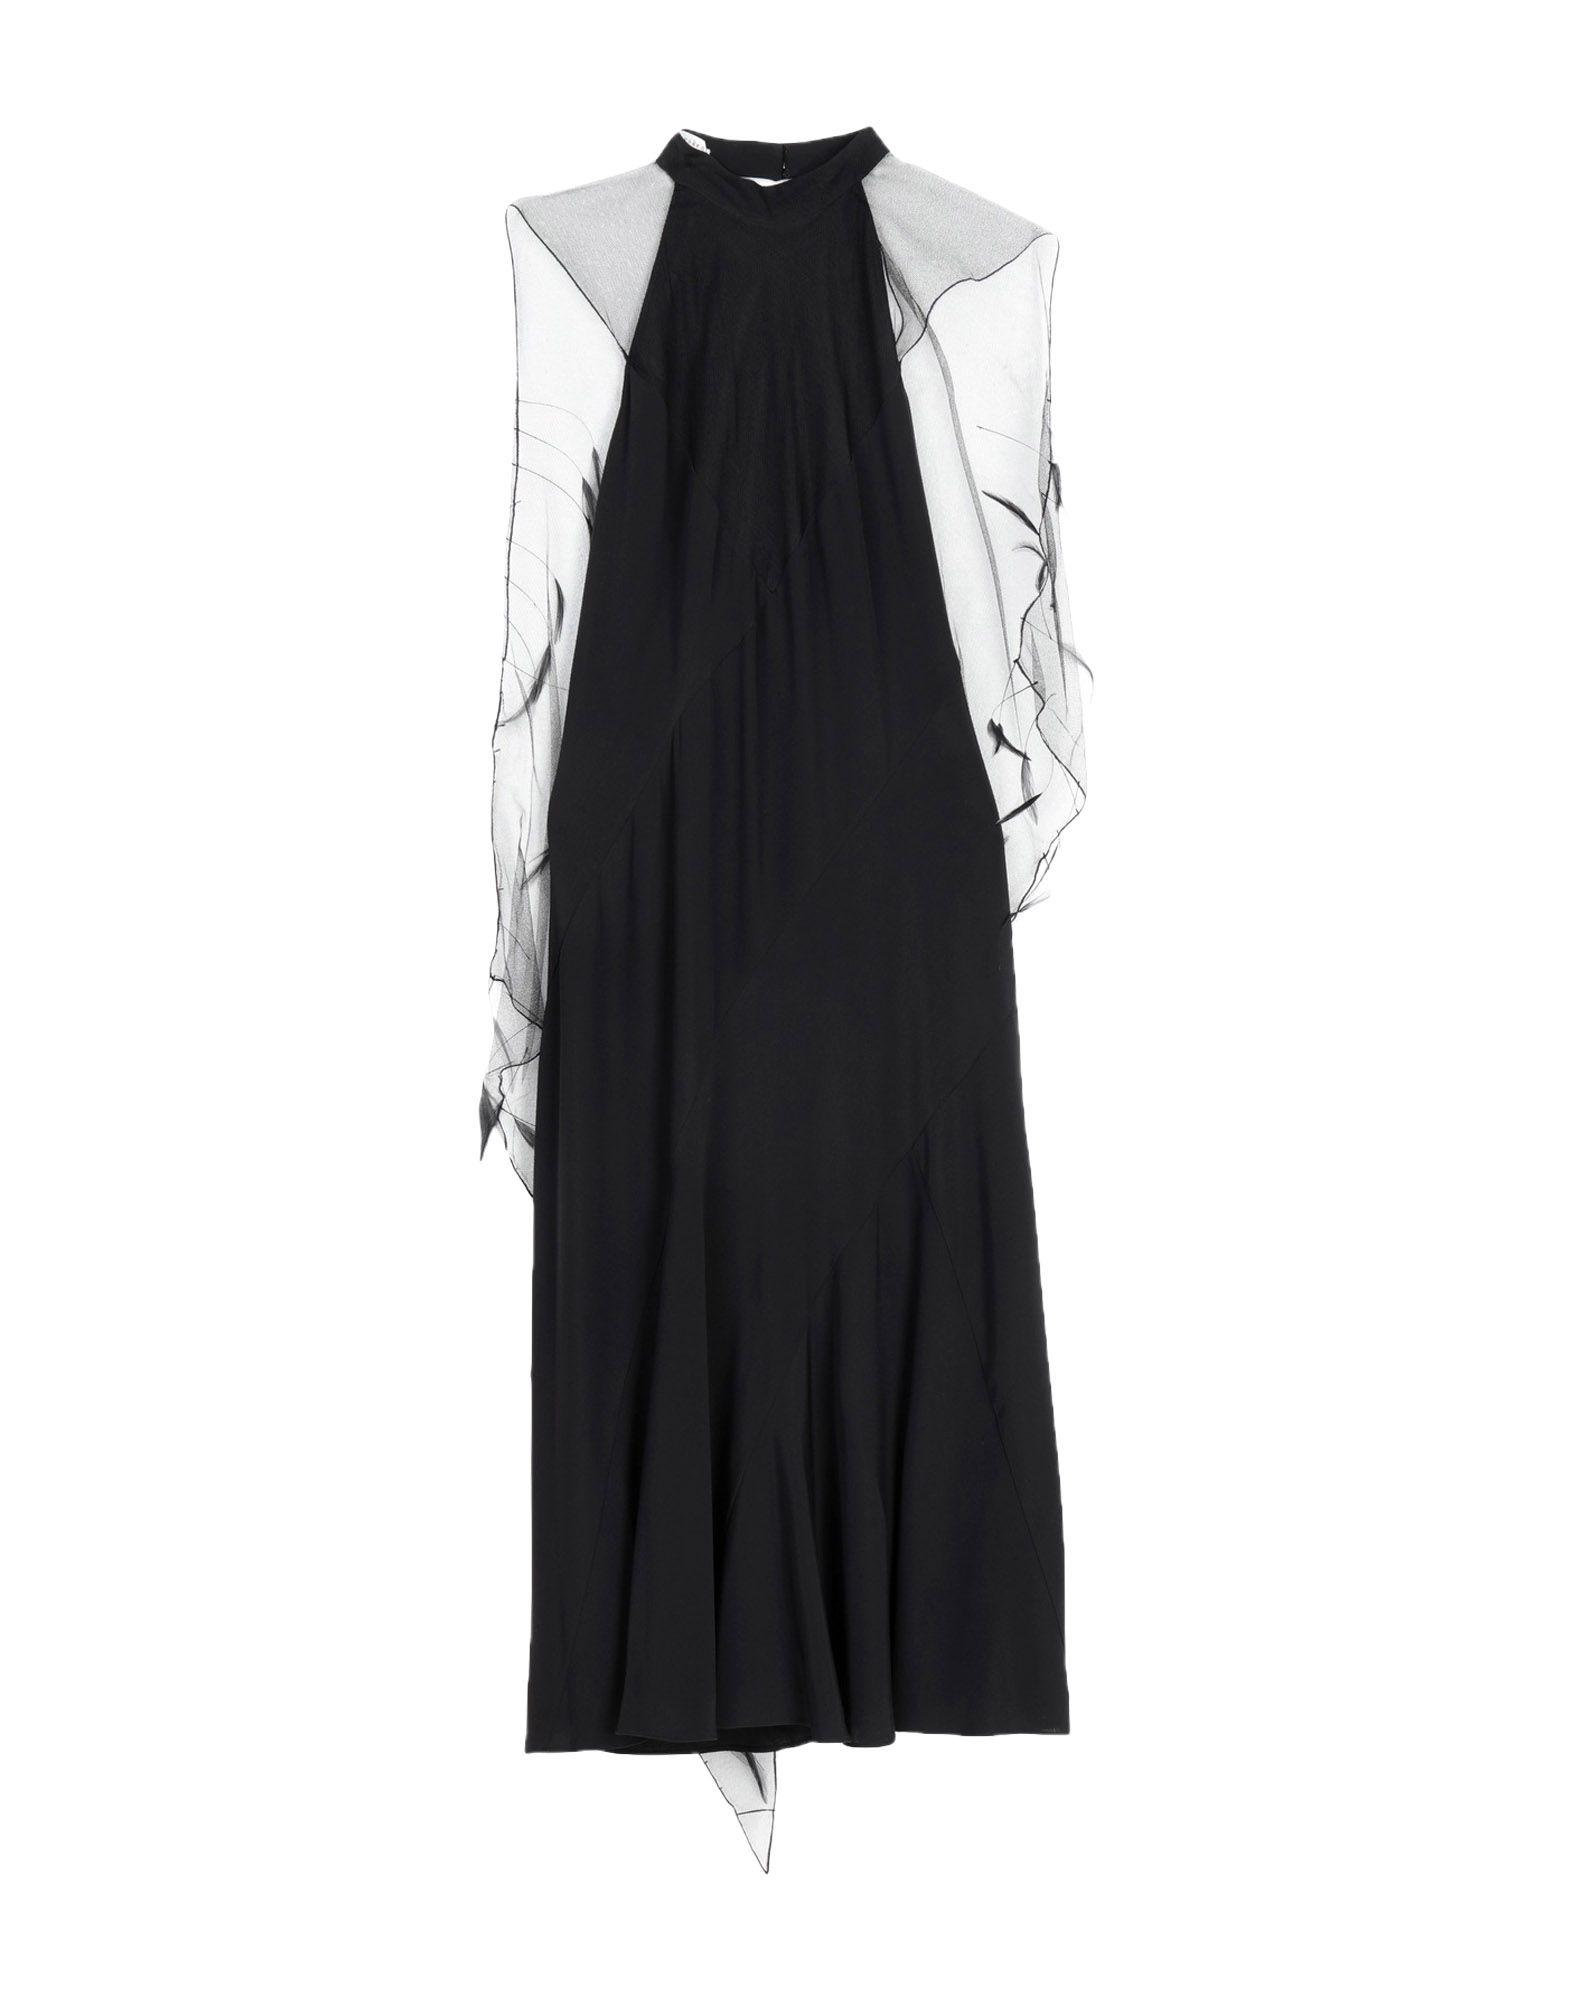 OLIVIER THEYSKENS Платье длиной 3/4 vel vel 03 01 01 02200